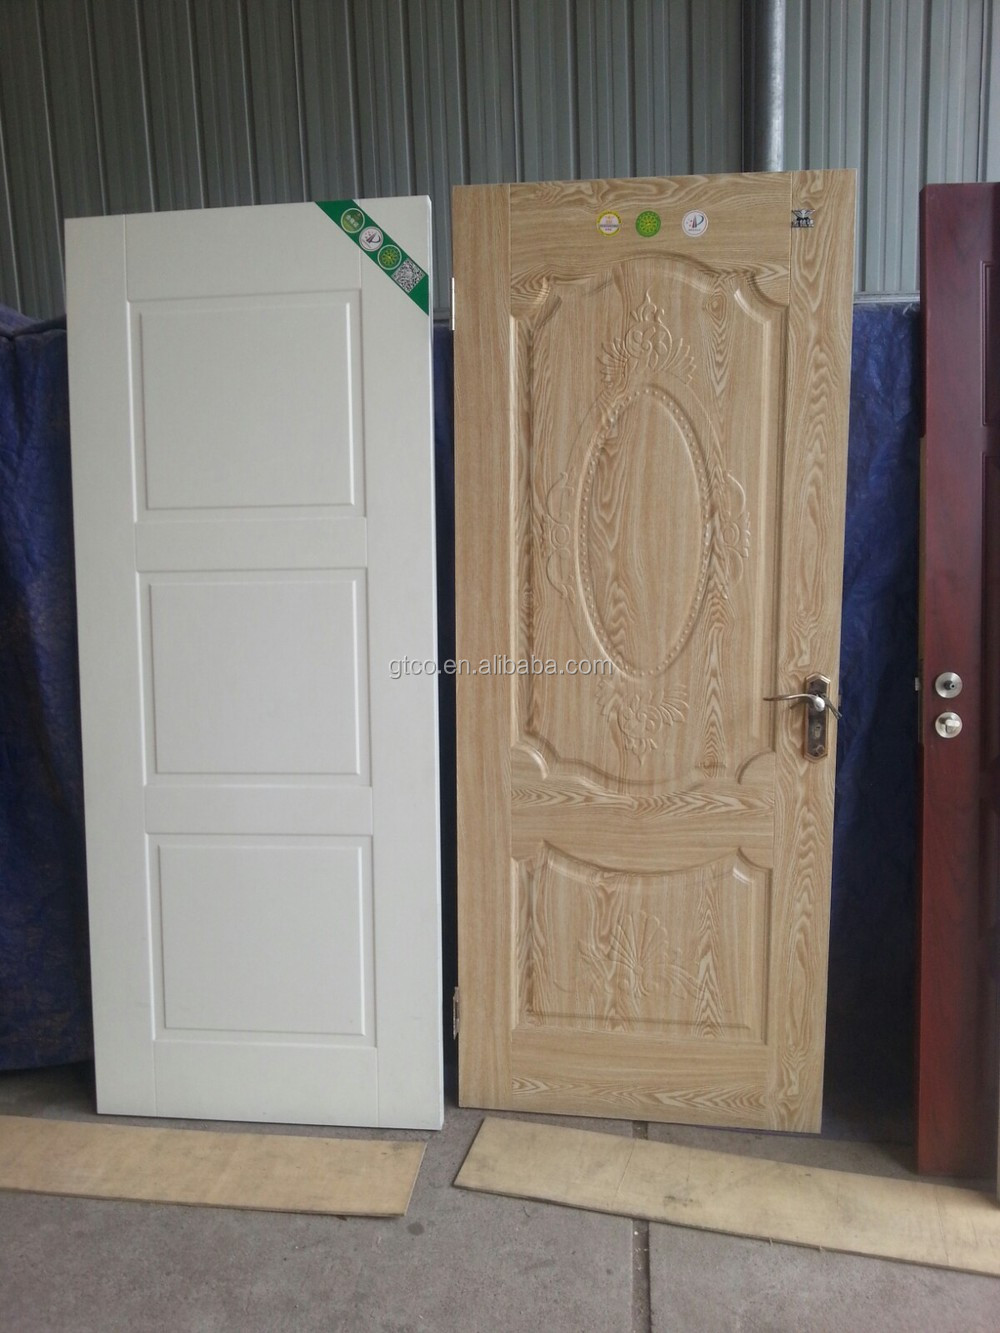 commerce assurance okoum placage de bois. Black Bedroom Furniture Sets. Home Design Ideas